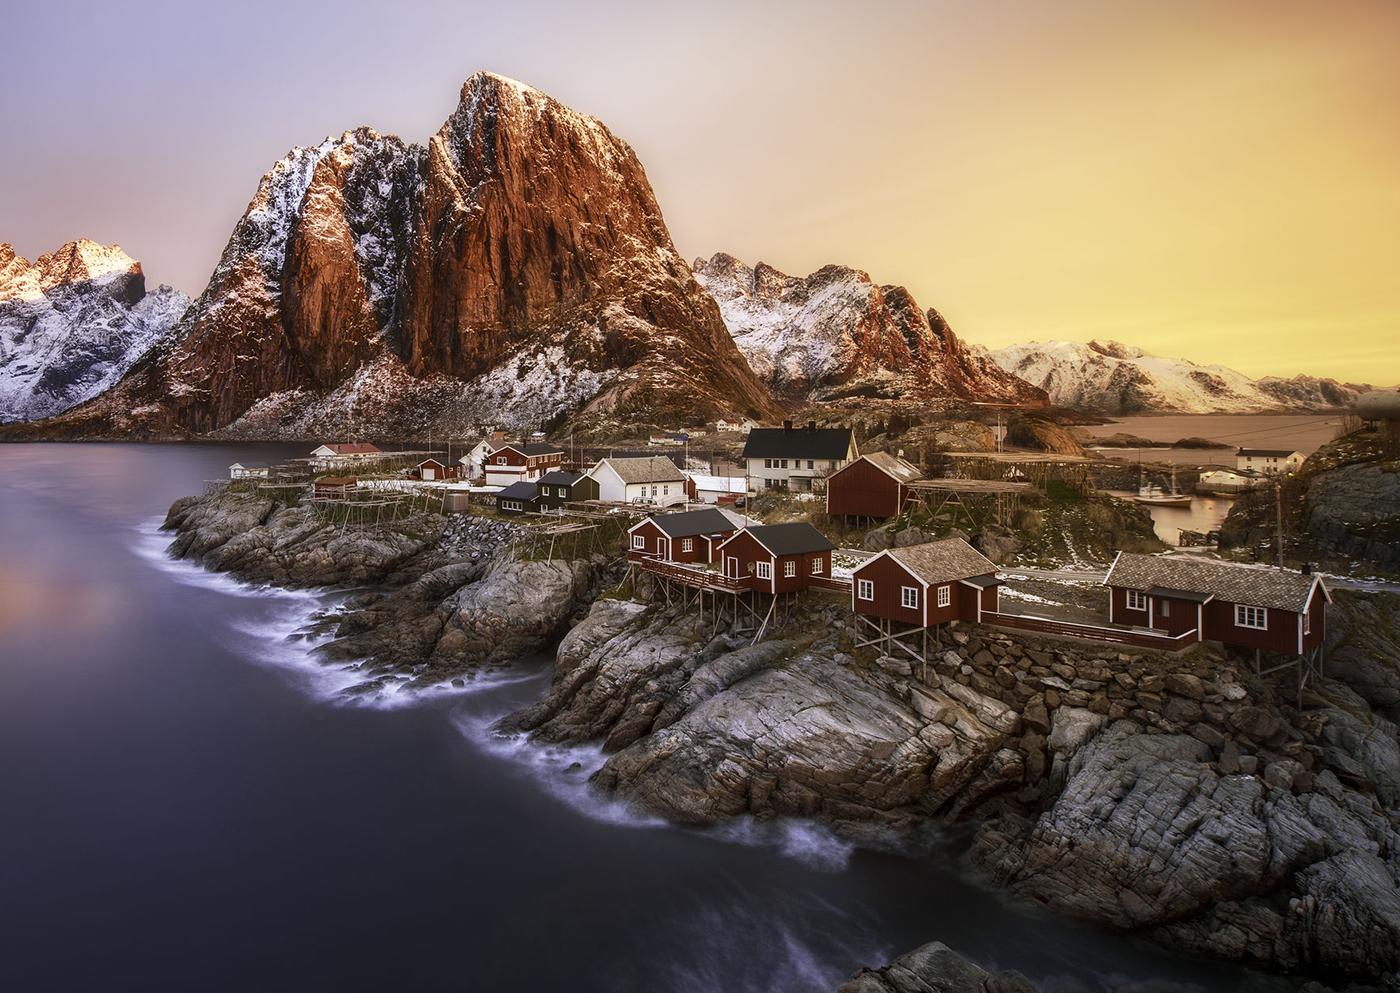 my-wanderlustnotes-5-giorni-alle-lofoten-in-inverno-nusfjord